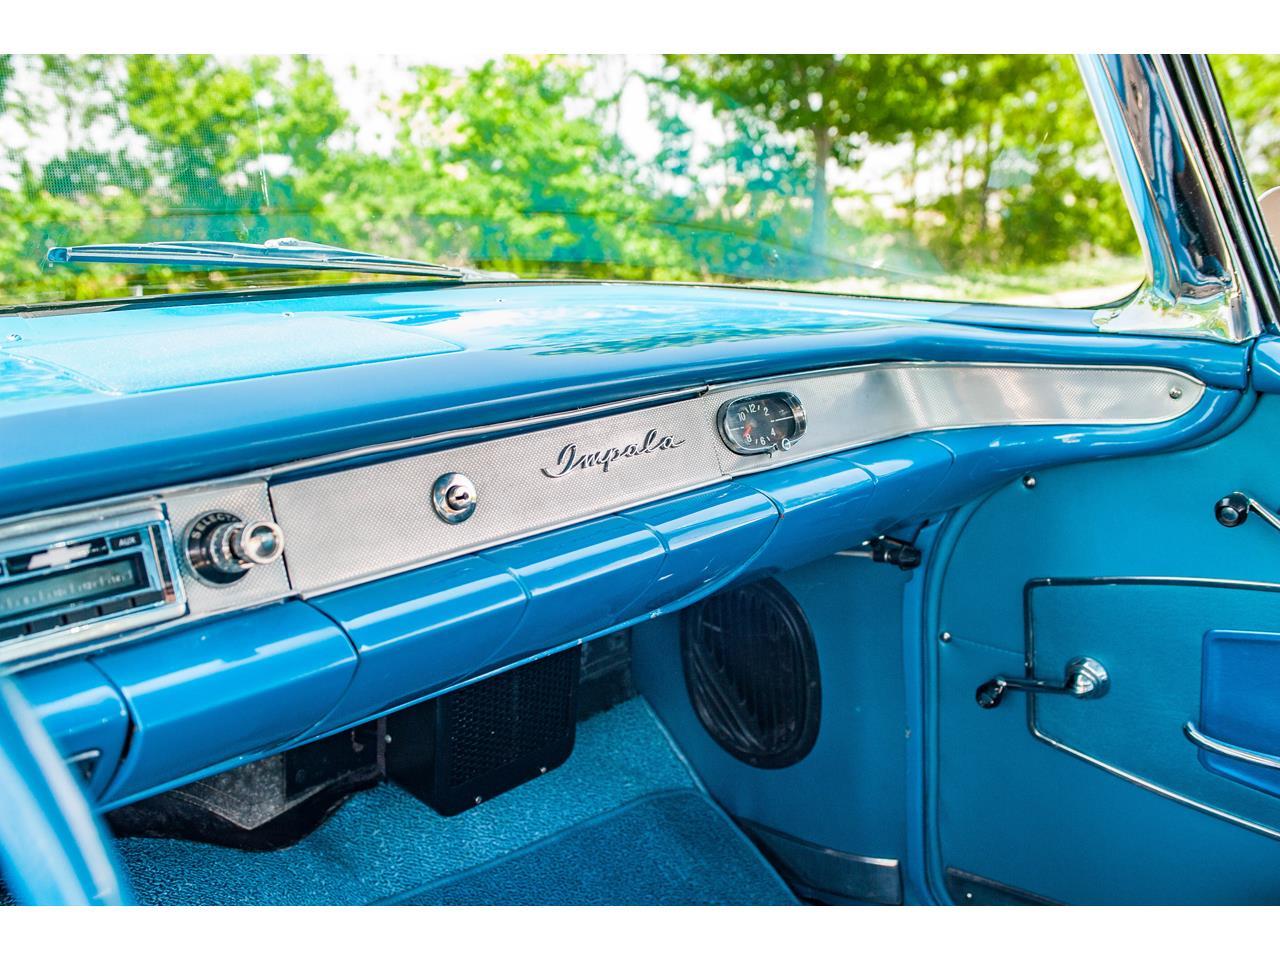 Large Picture of Classic '58 Impala located in O'Fallon Illinois - QB9Q